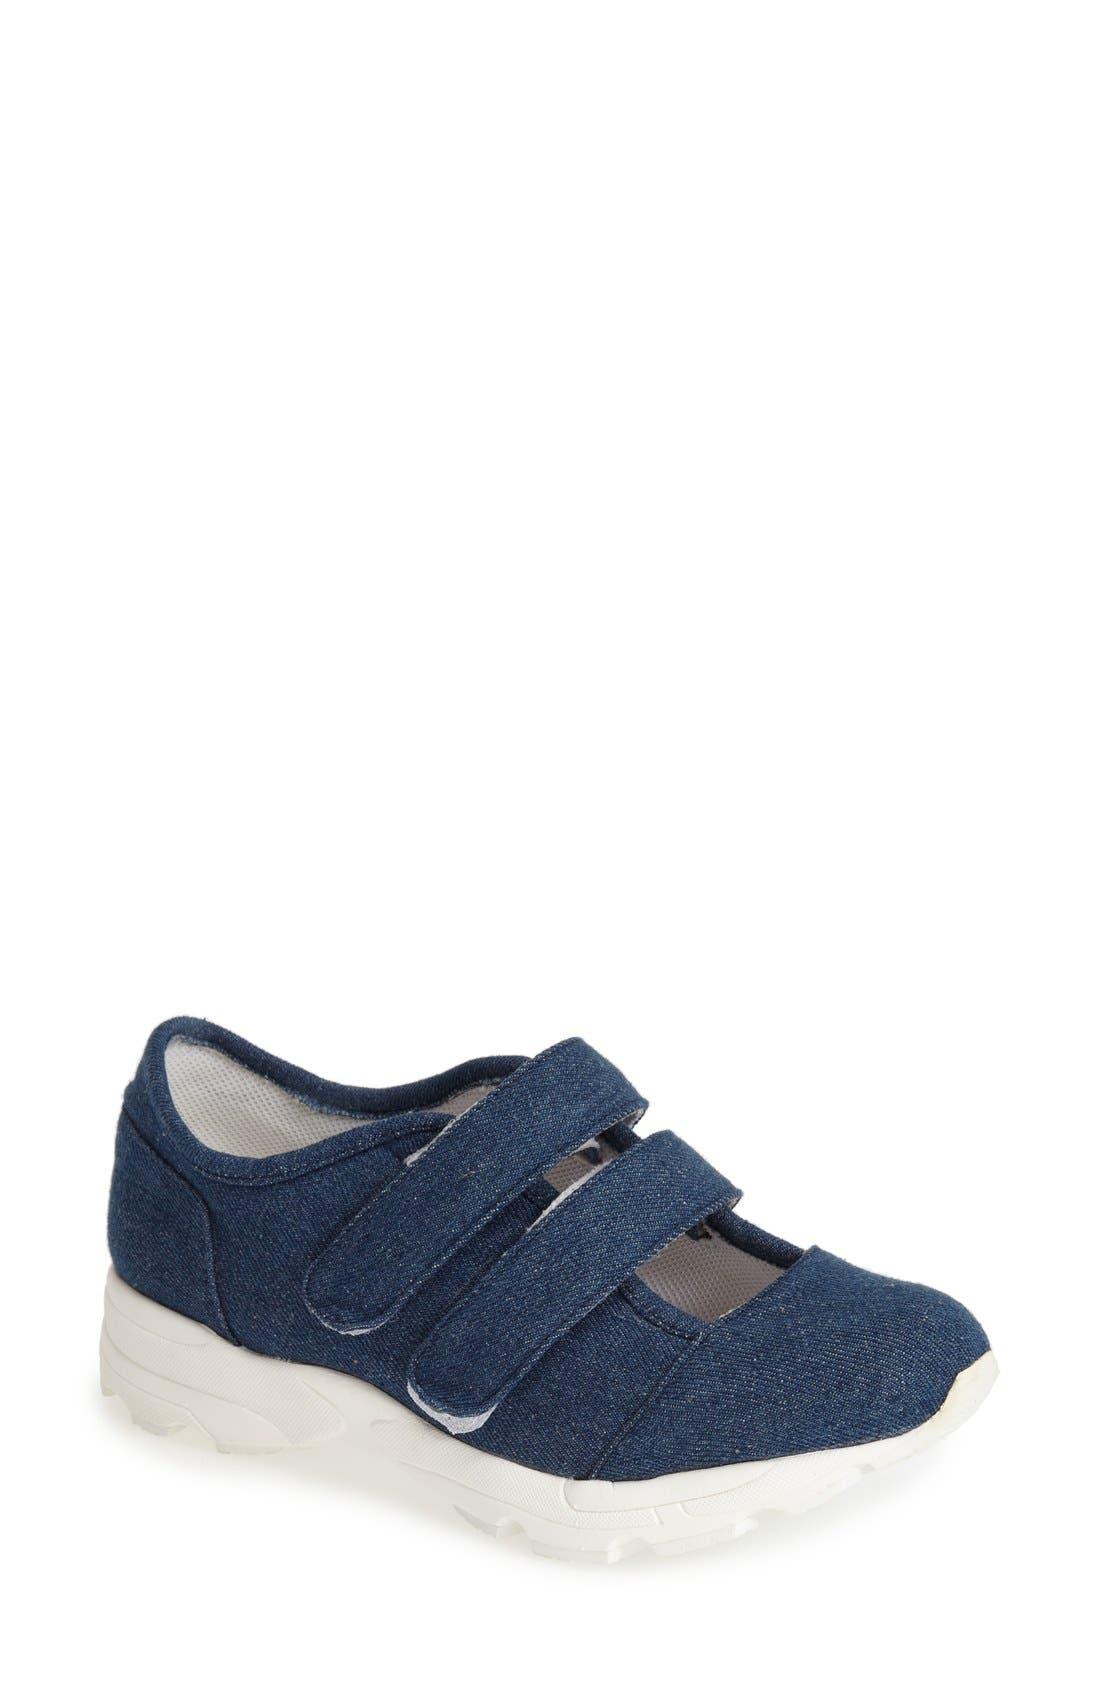 'Lucille 2' Open Top Sneaker, Main, color, 487